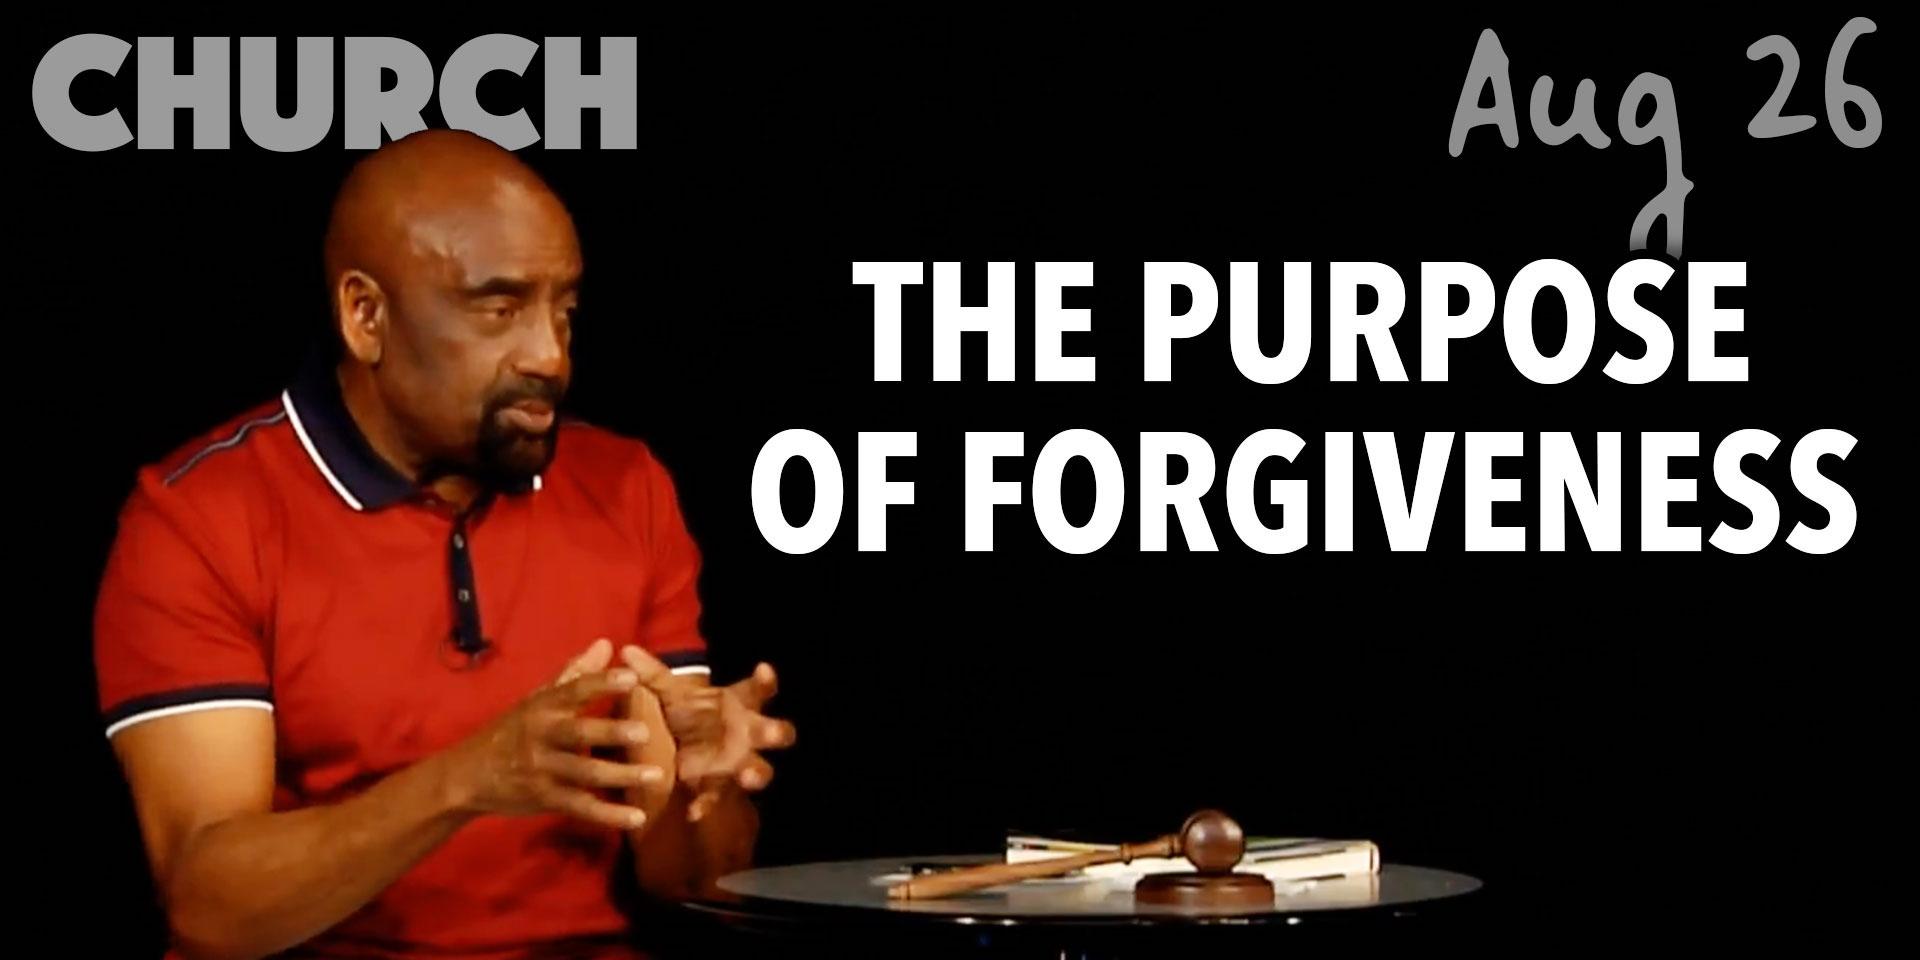 The Purpose of Forgiveness (Church, Aug 26)